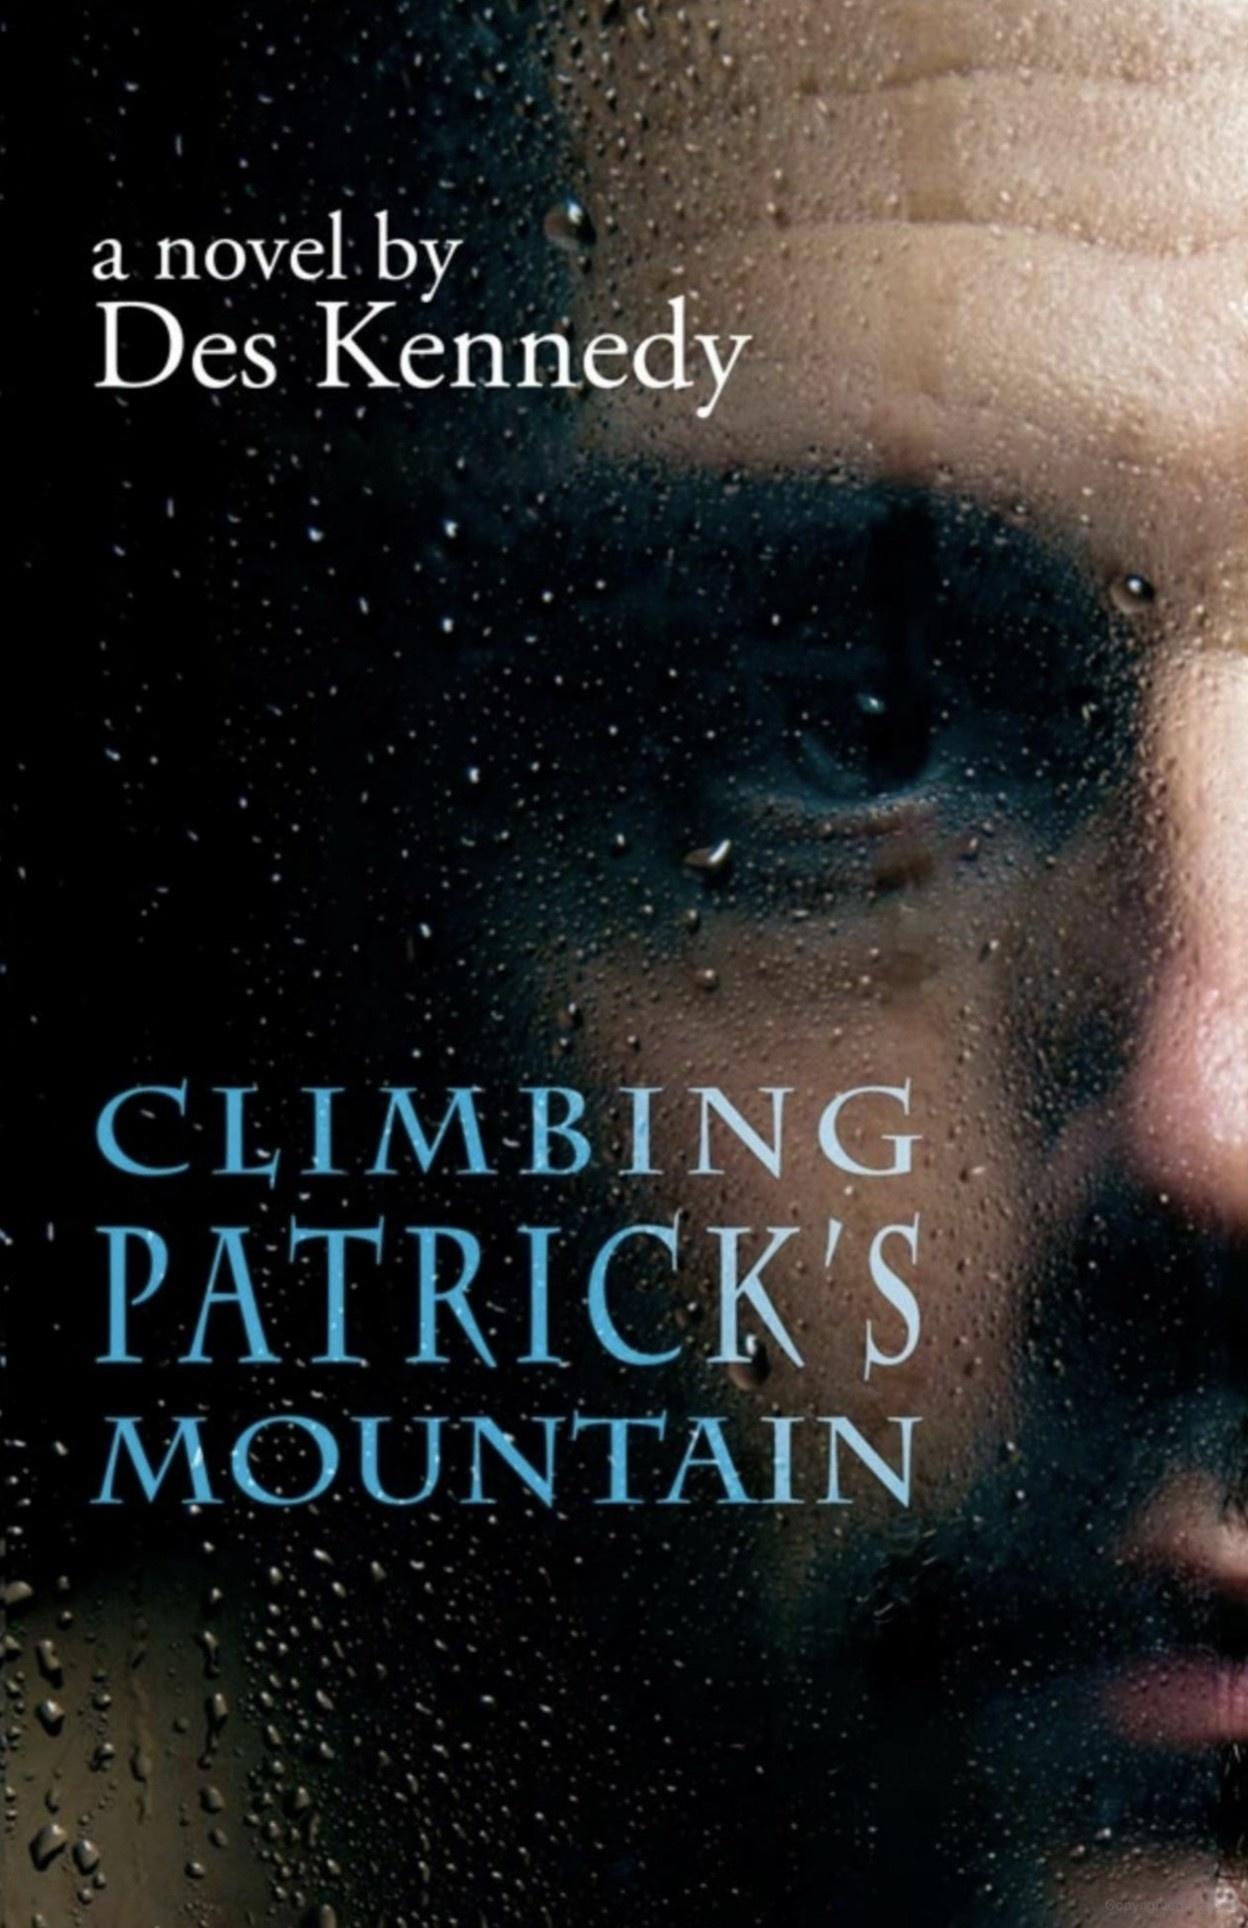 Climbing Patrick's Mountain